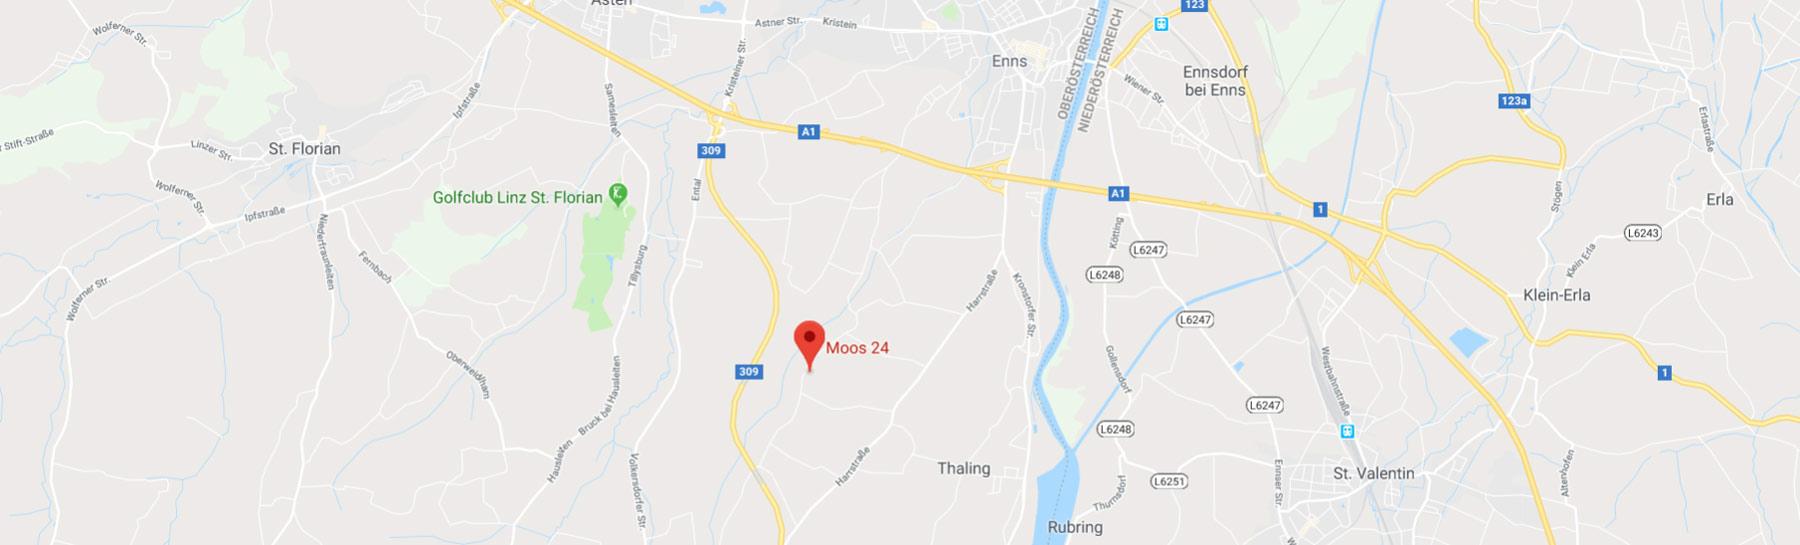 Moos 24 4470 Enns Google Maps